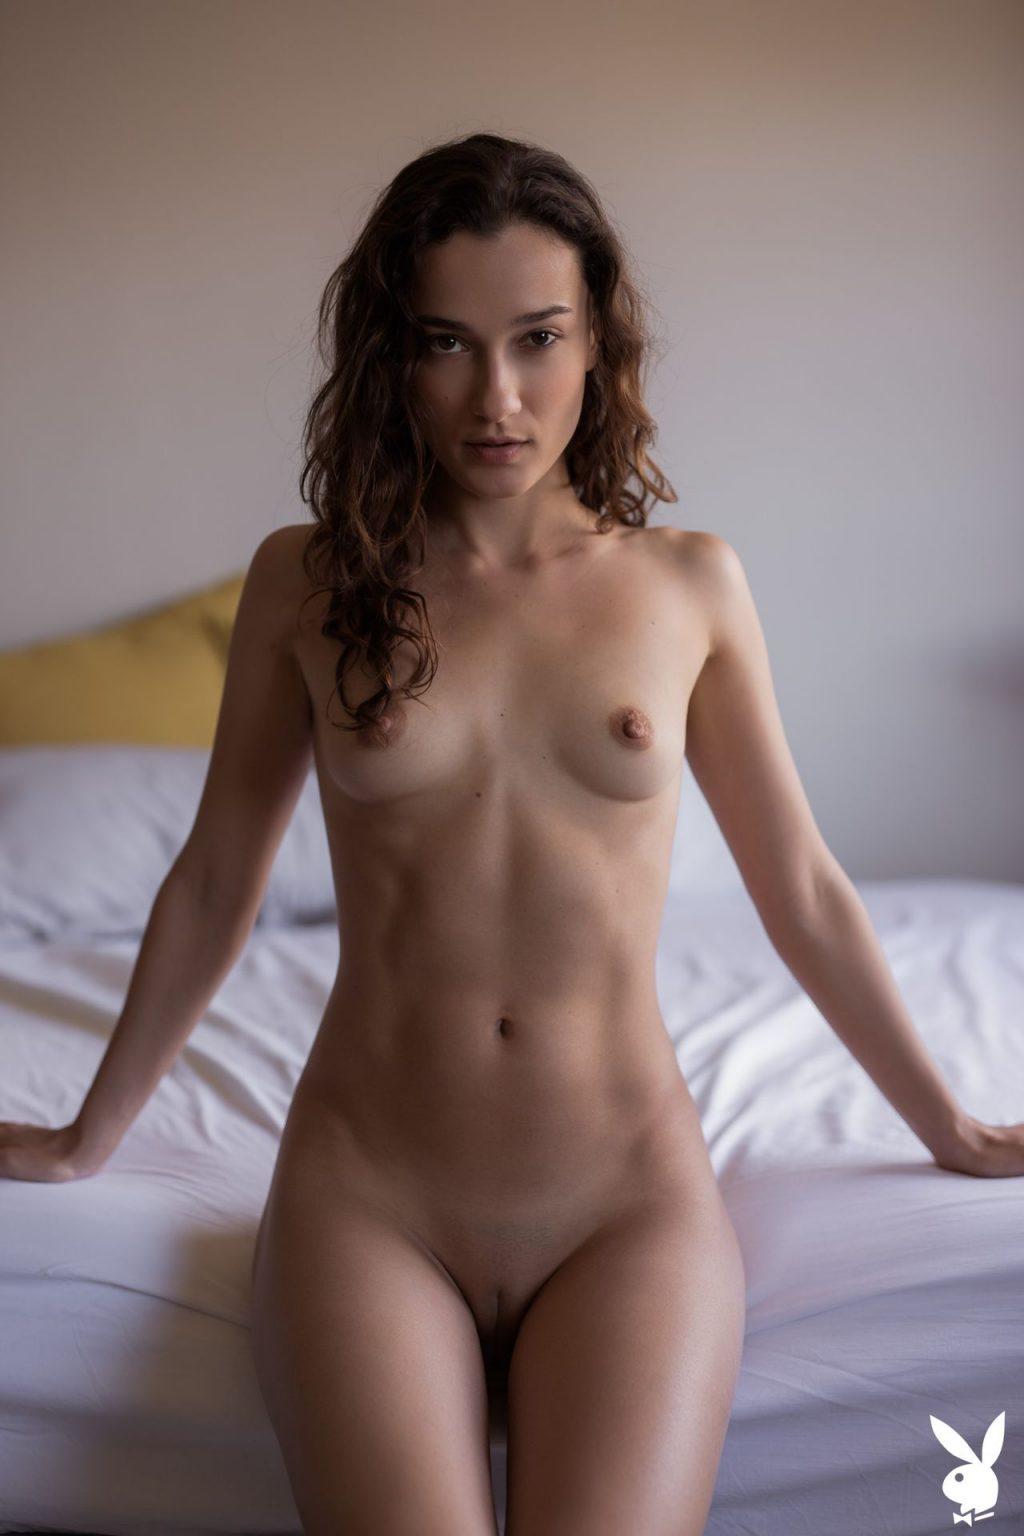 Amelle Berrabah Nude sophie ka nude (5 photos) – ( ͡° ͜ʖ ͡°)  the fappening